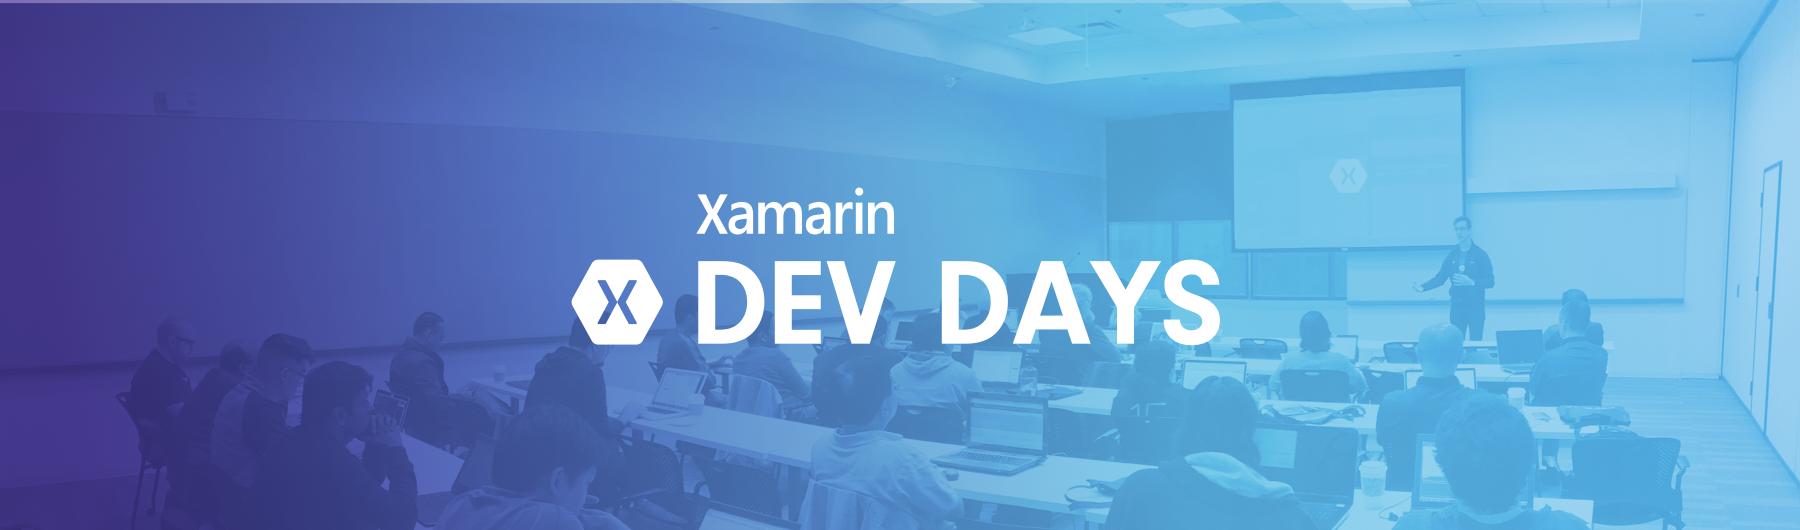 Xamarin Dev Days - Edegem